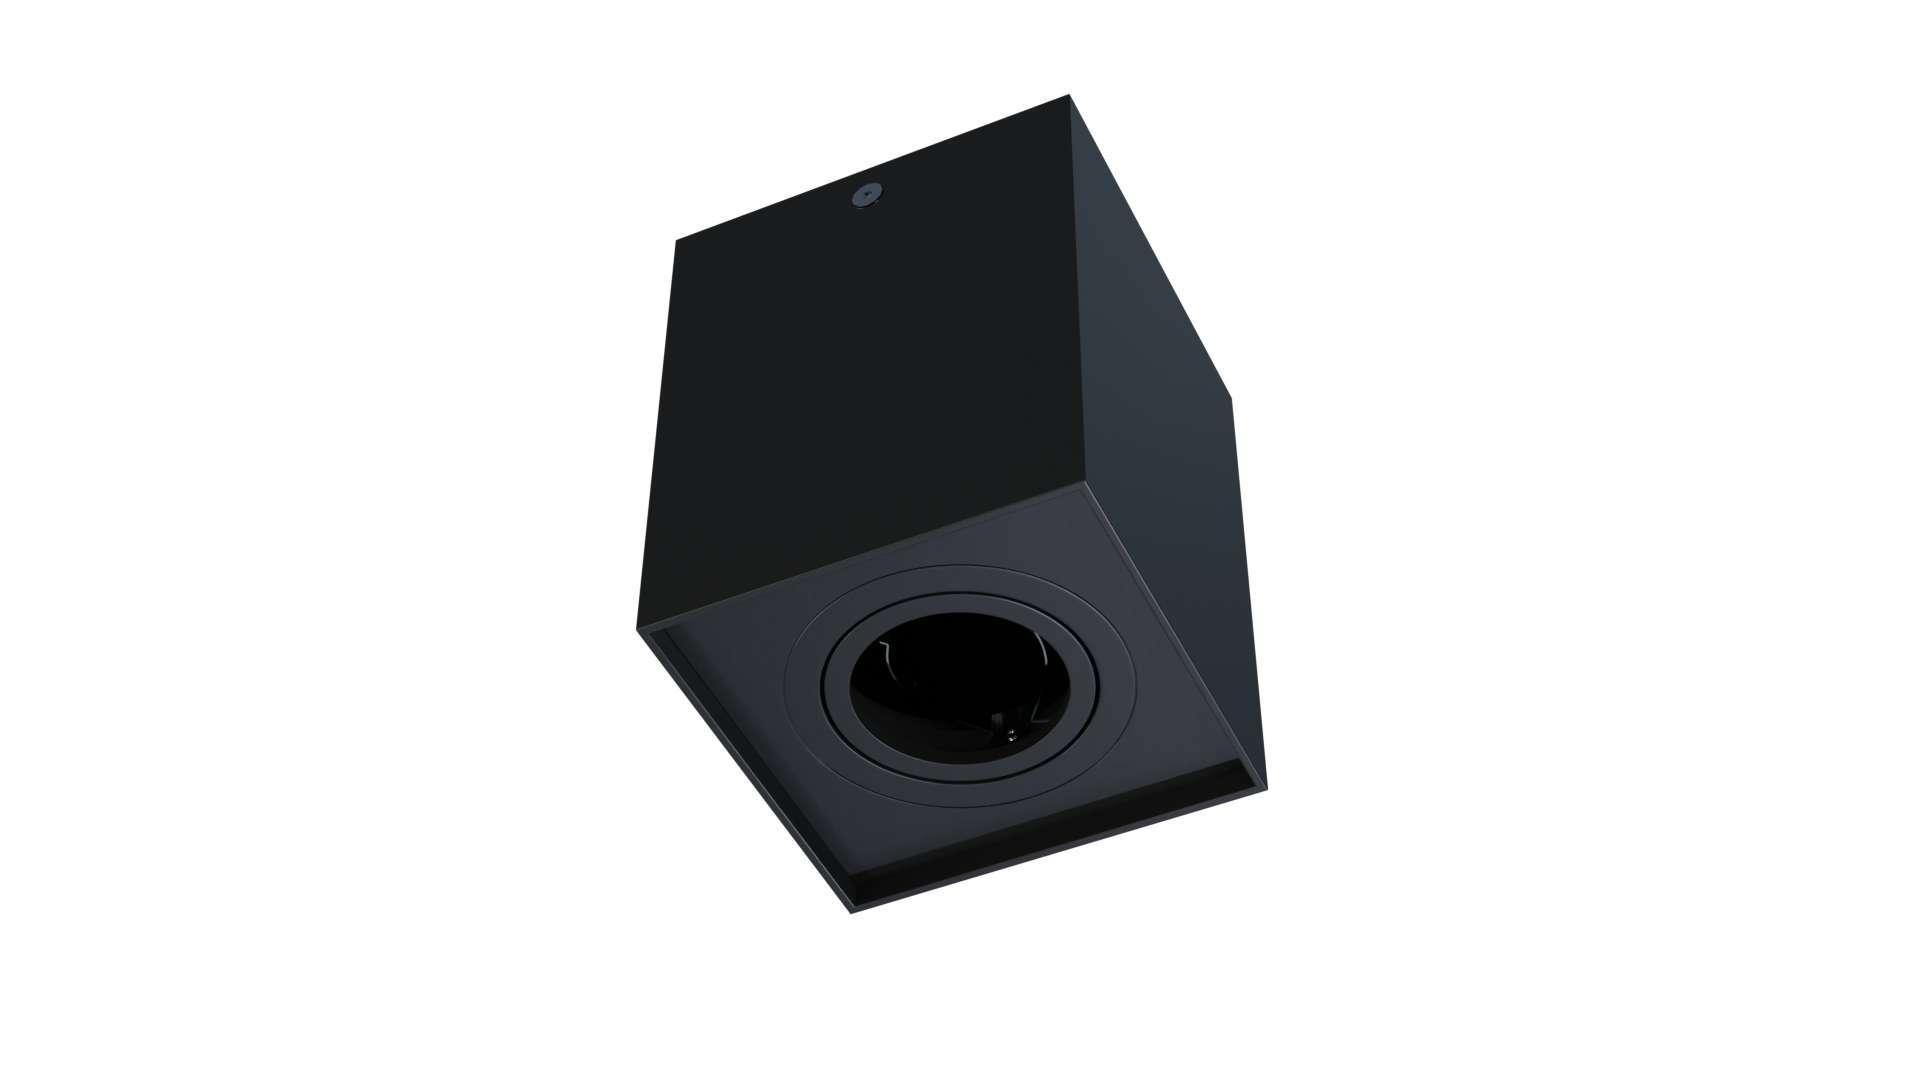 Ceiling spotlight fixture SPOT BERGEN square black